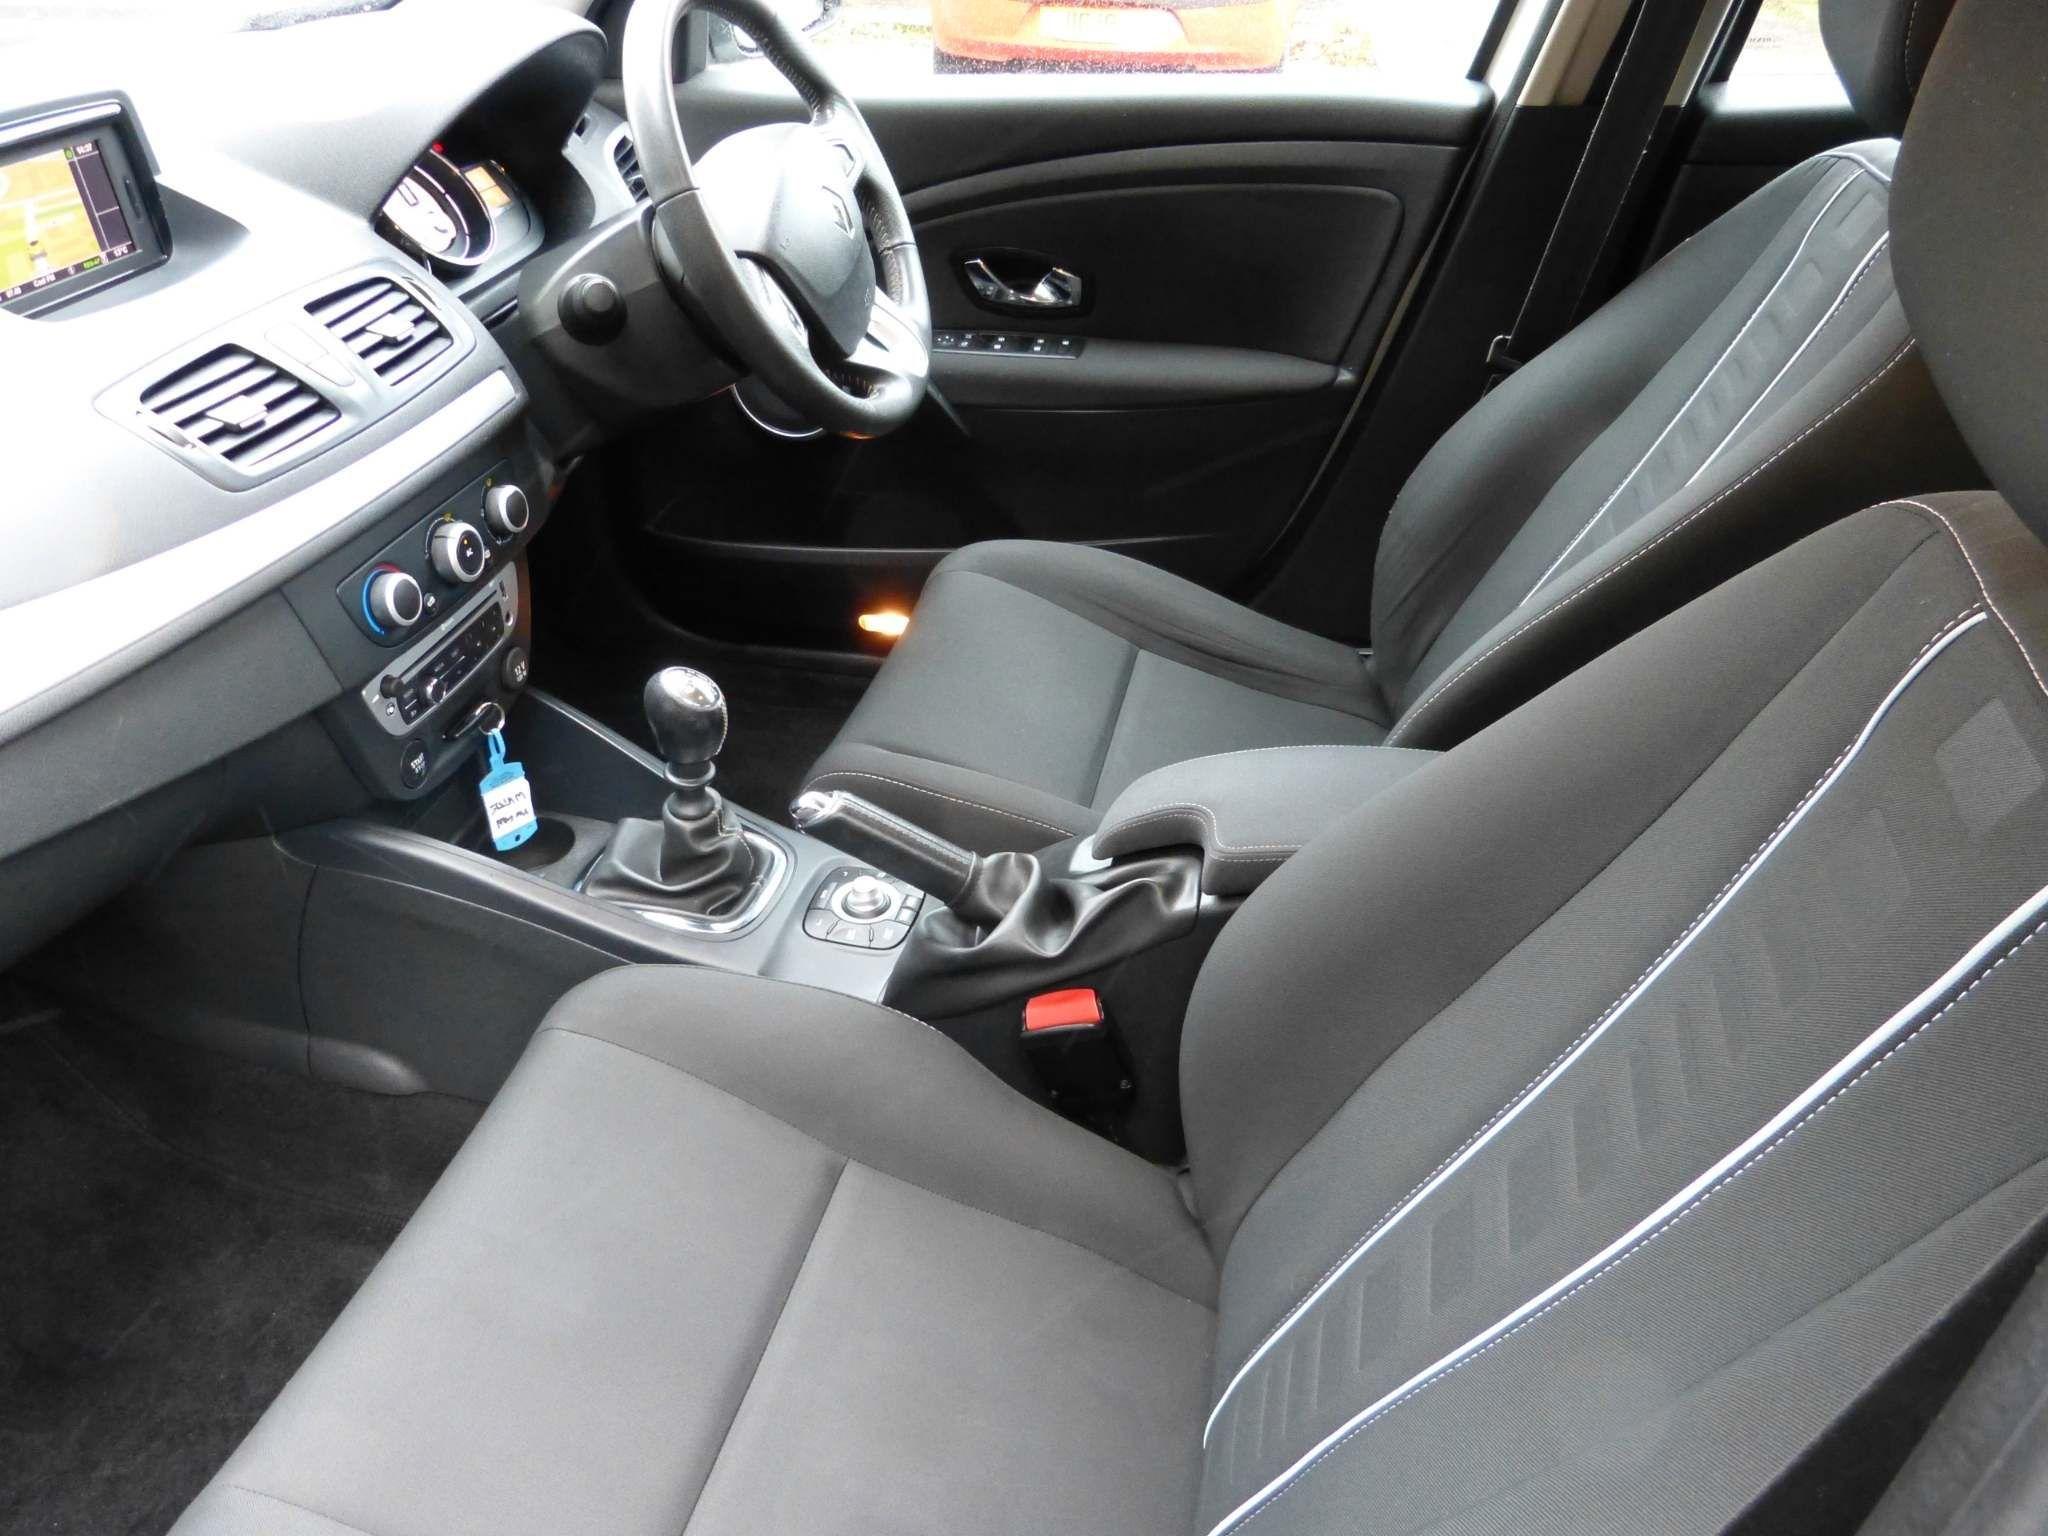 2012 RENAULT Megane 1.6 16v Dynamique Tom Tom  (Tom Tom) Petrol Manual  – Beechlawn Motors Belfast full